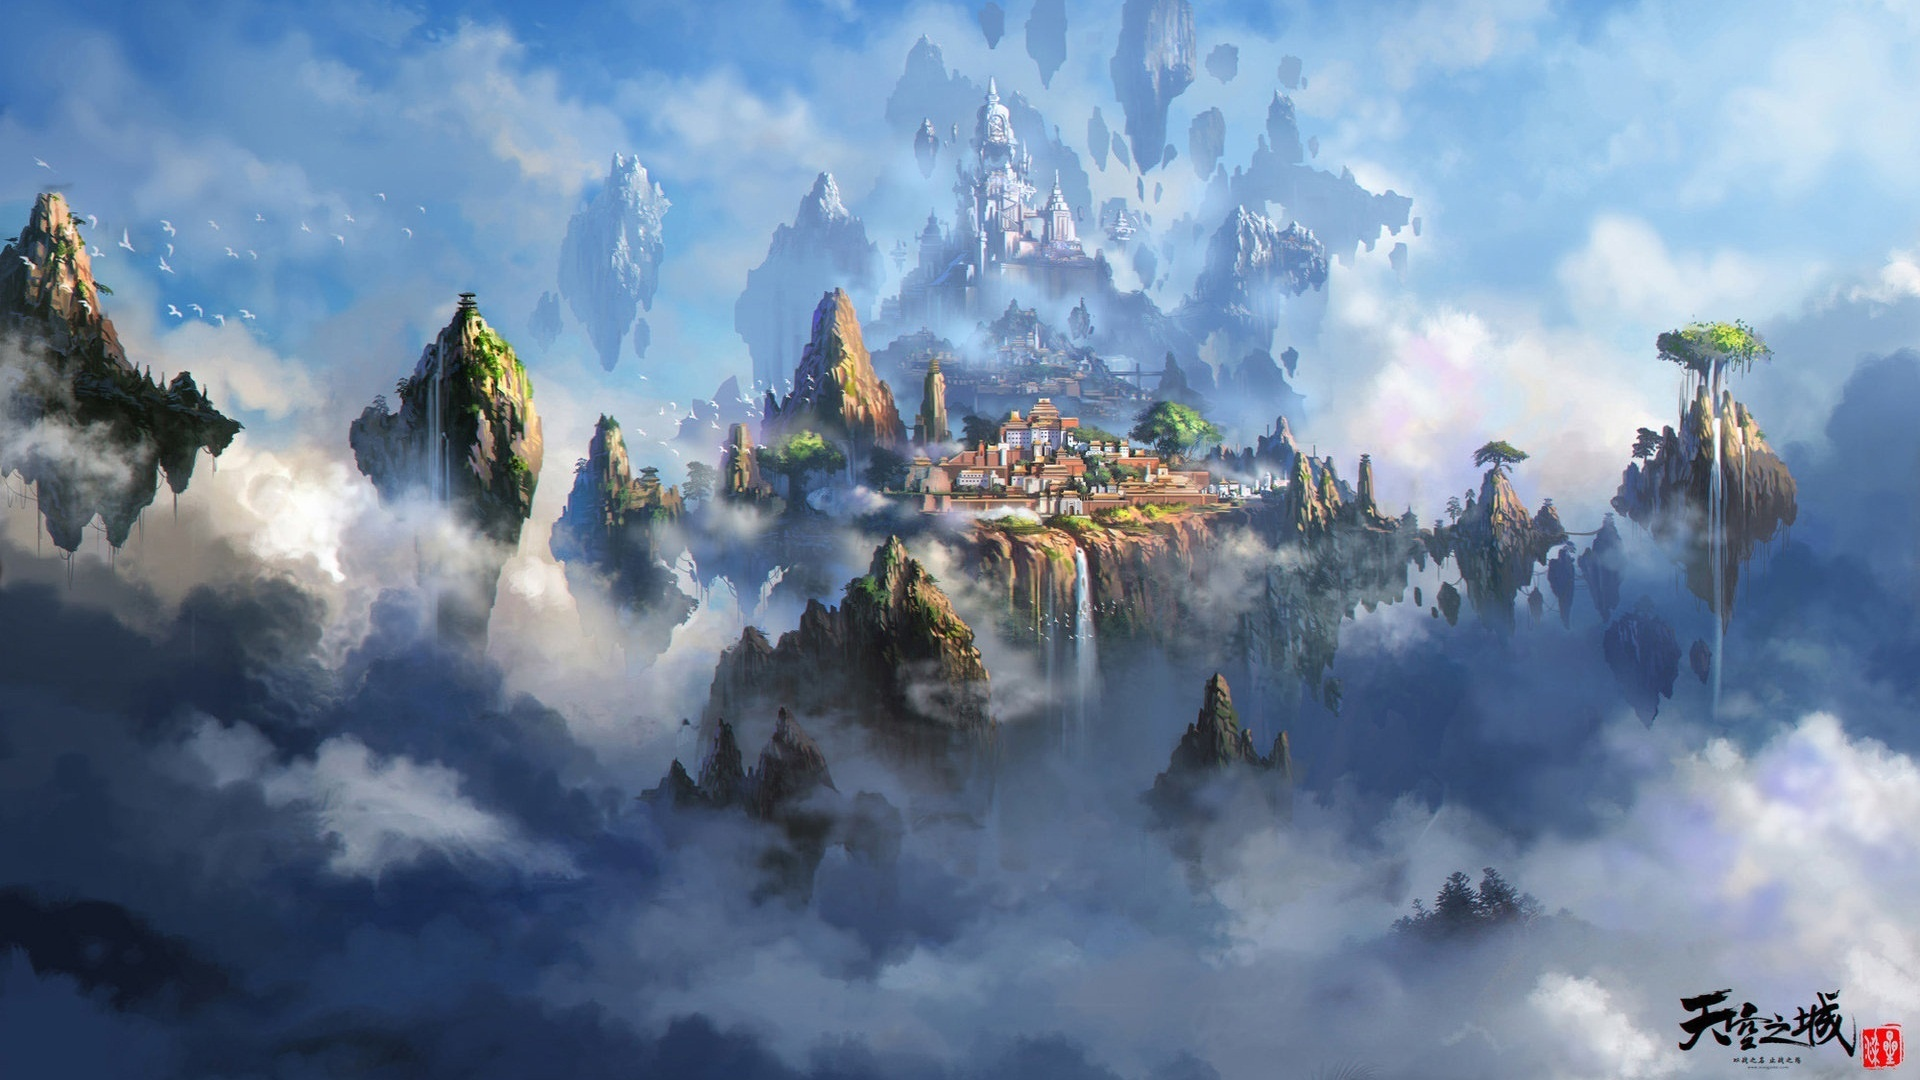 City In Clouds desktop wallpaper free download